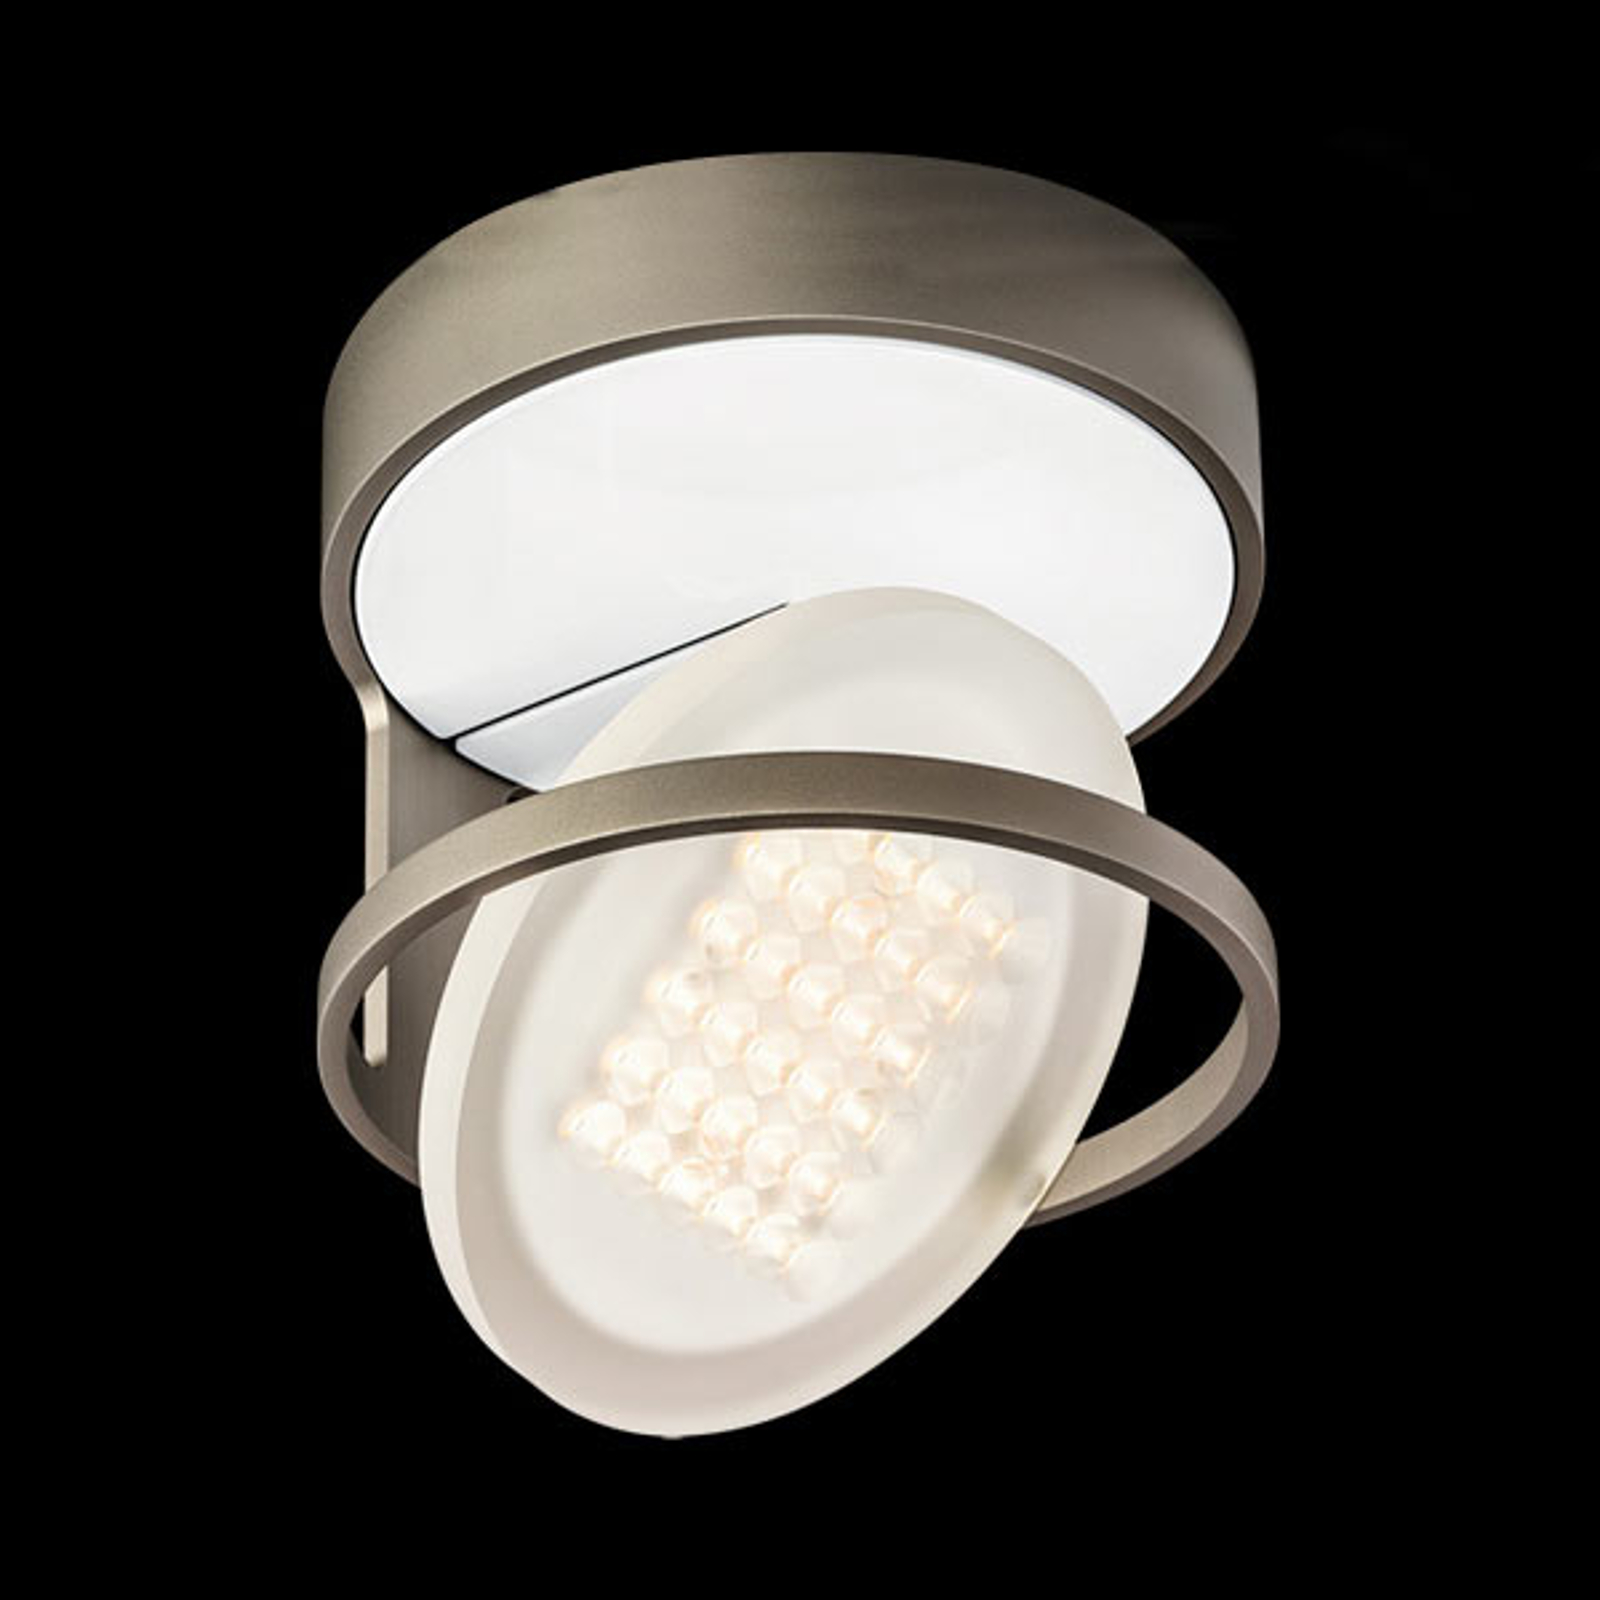 Nimbus Rim R 36 LED ceiling light_7018058_1